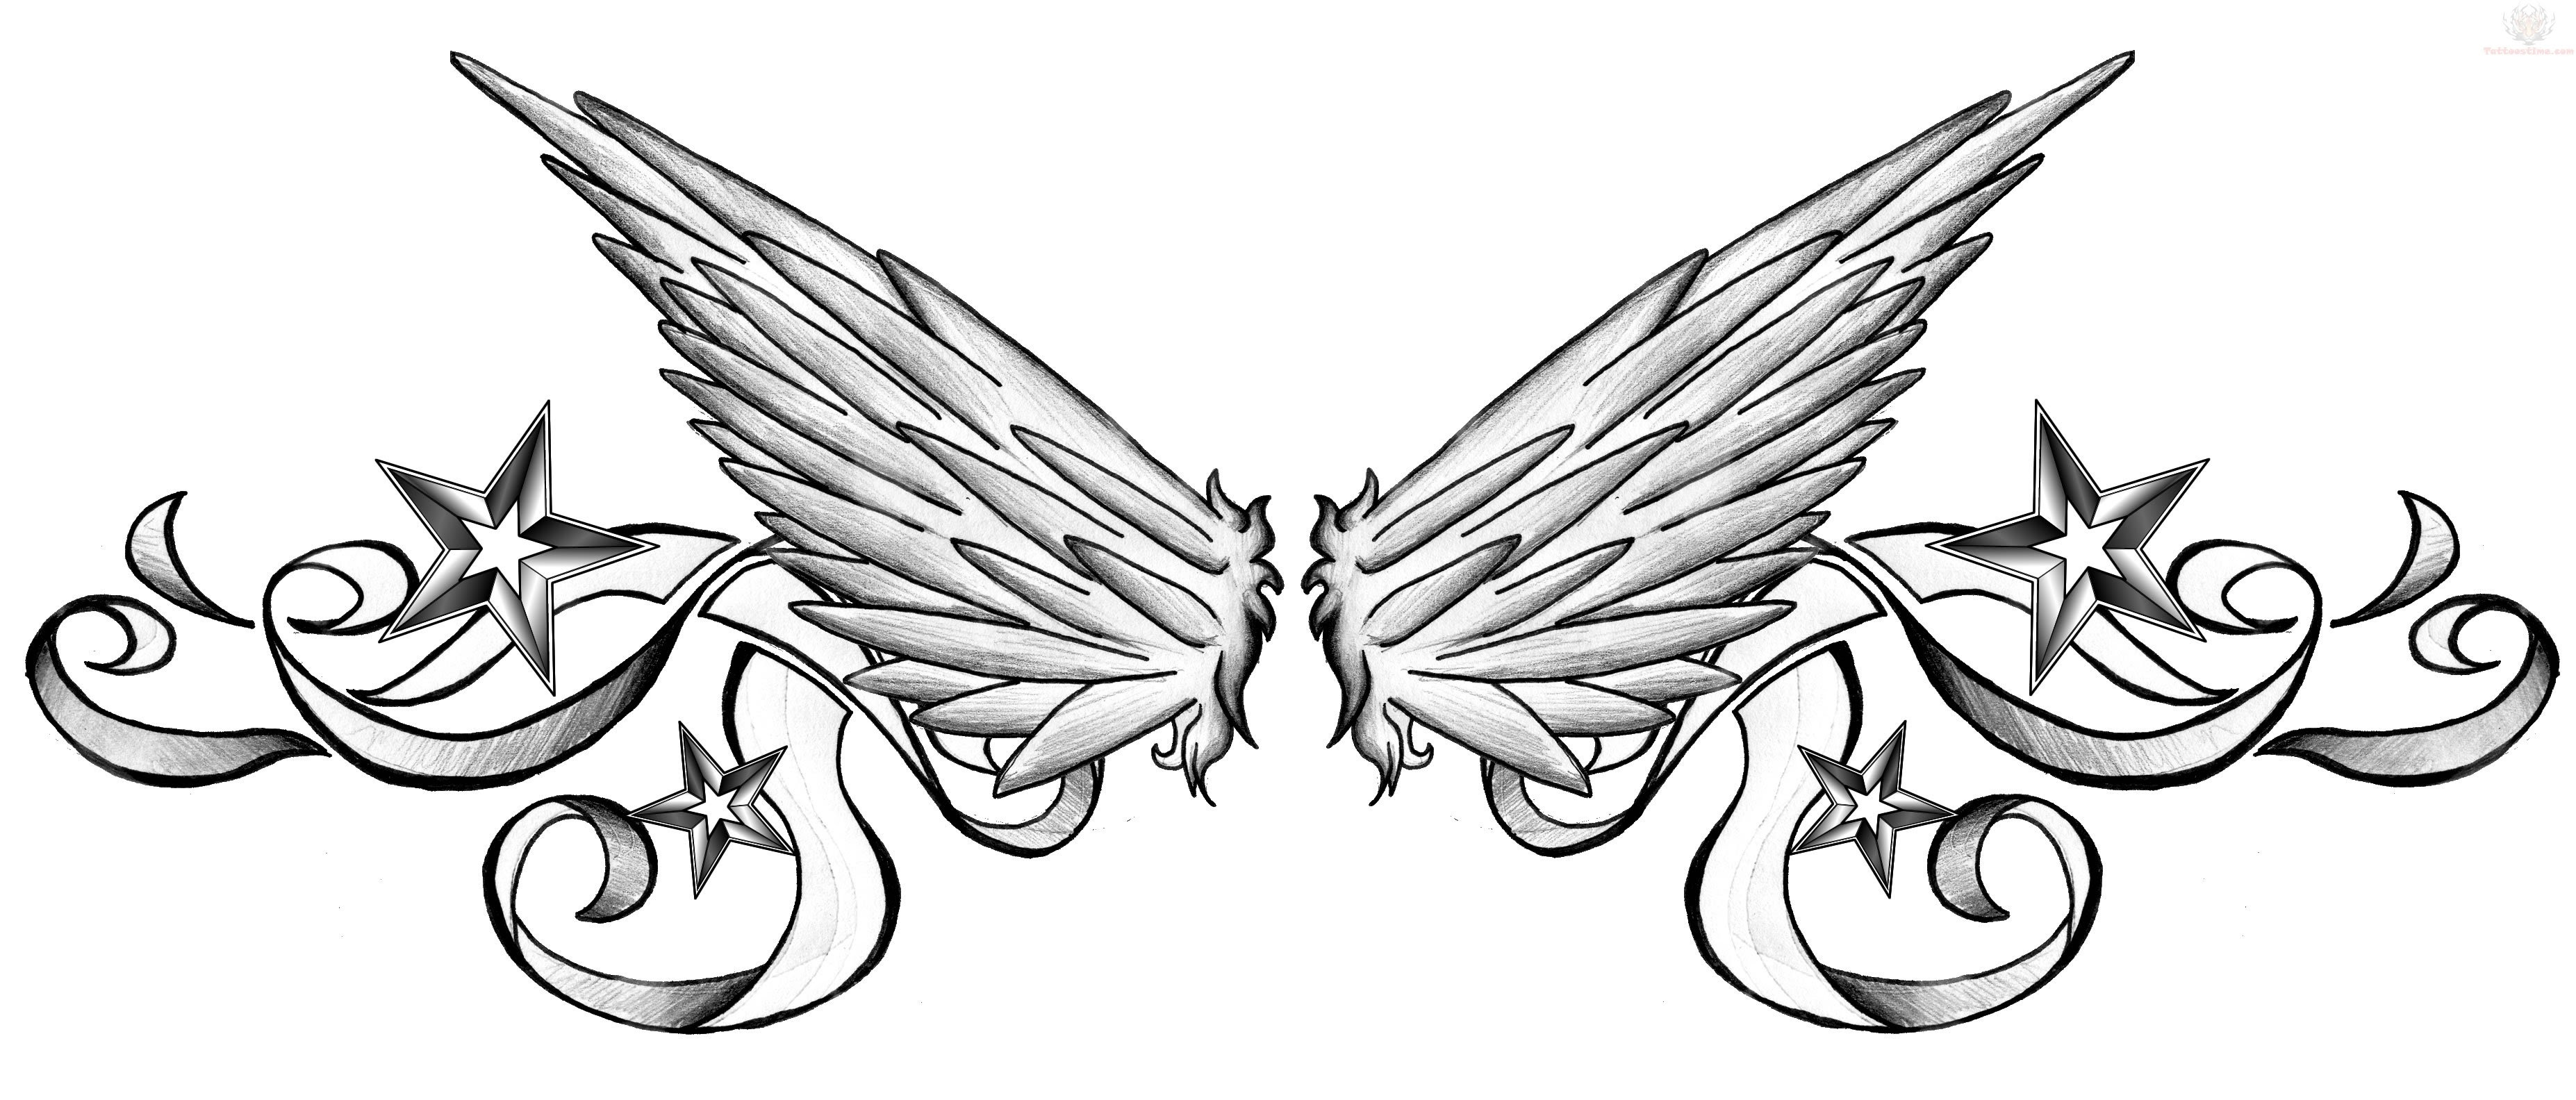 Guraded Angel Wings Tattoo On Lowerback